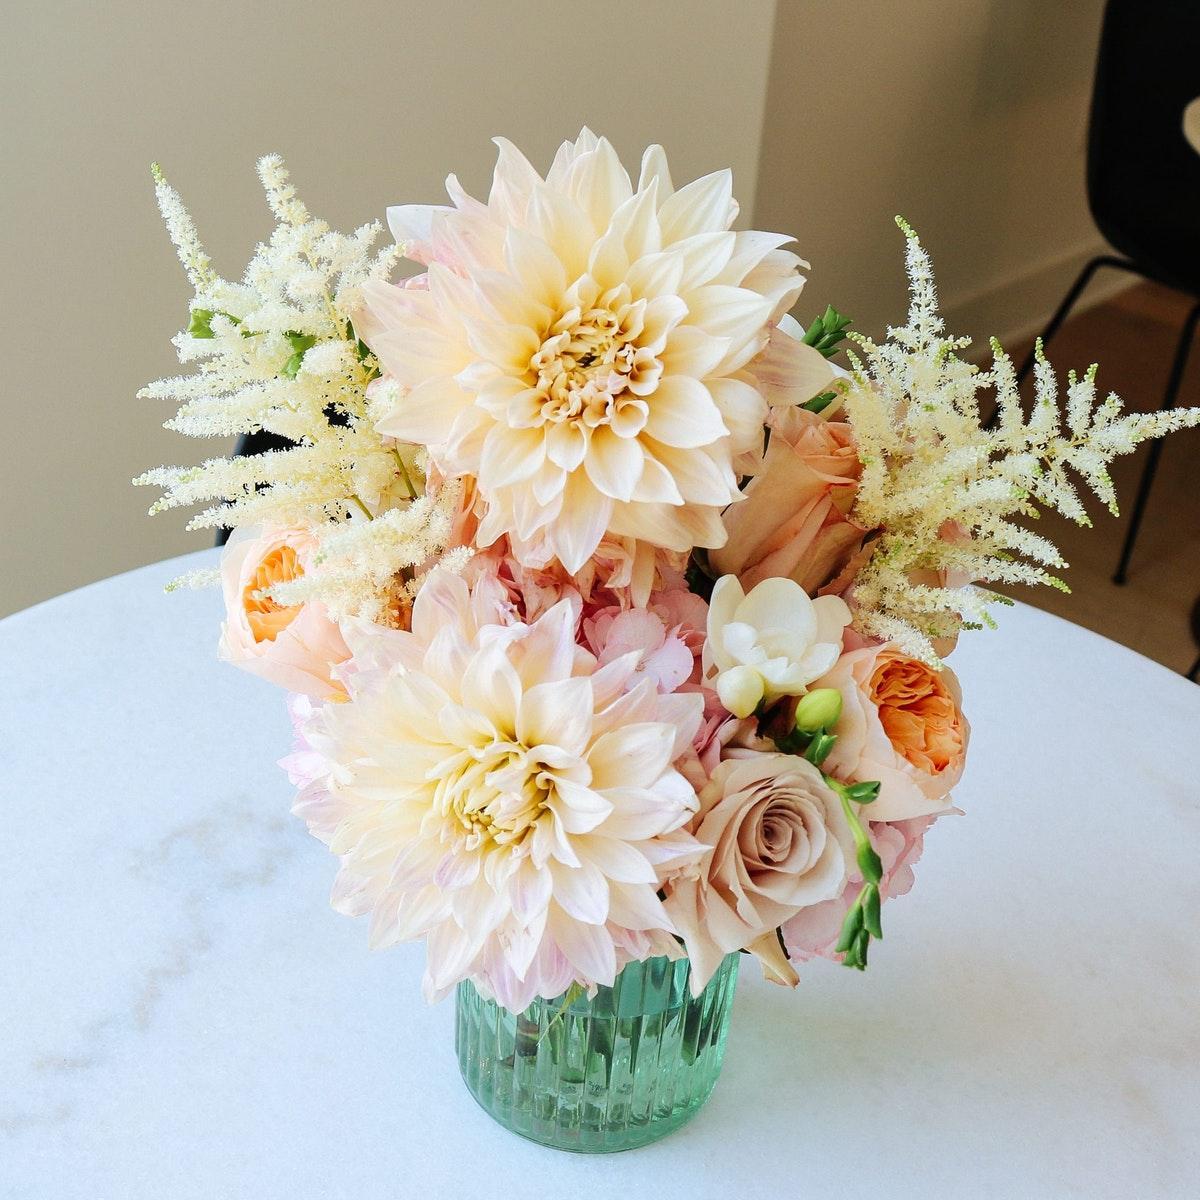 bloomie_new_york_florist_dahlias